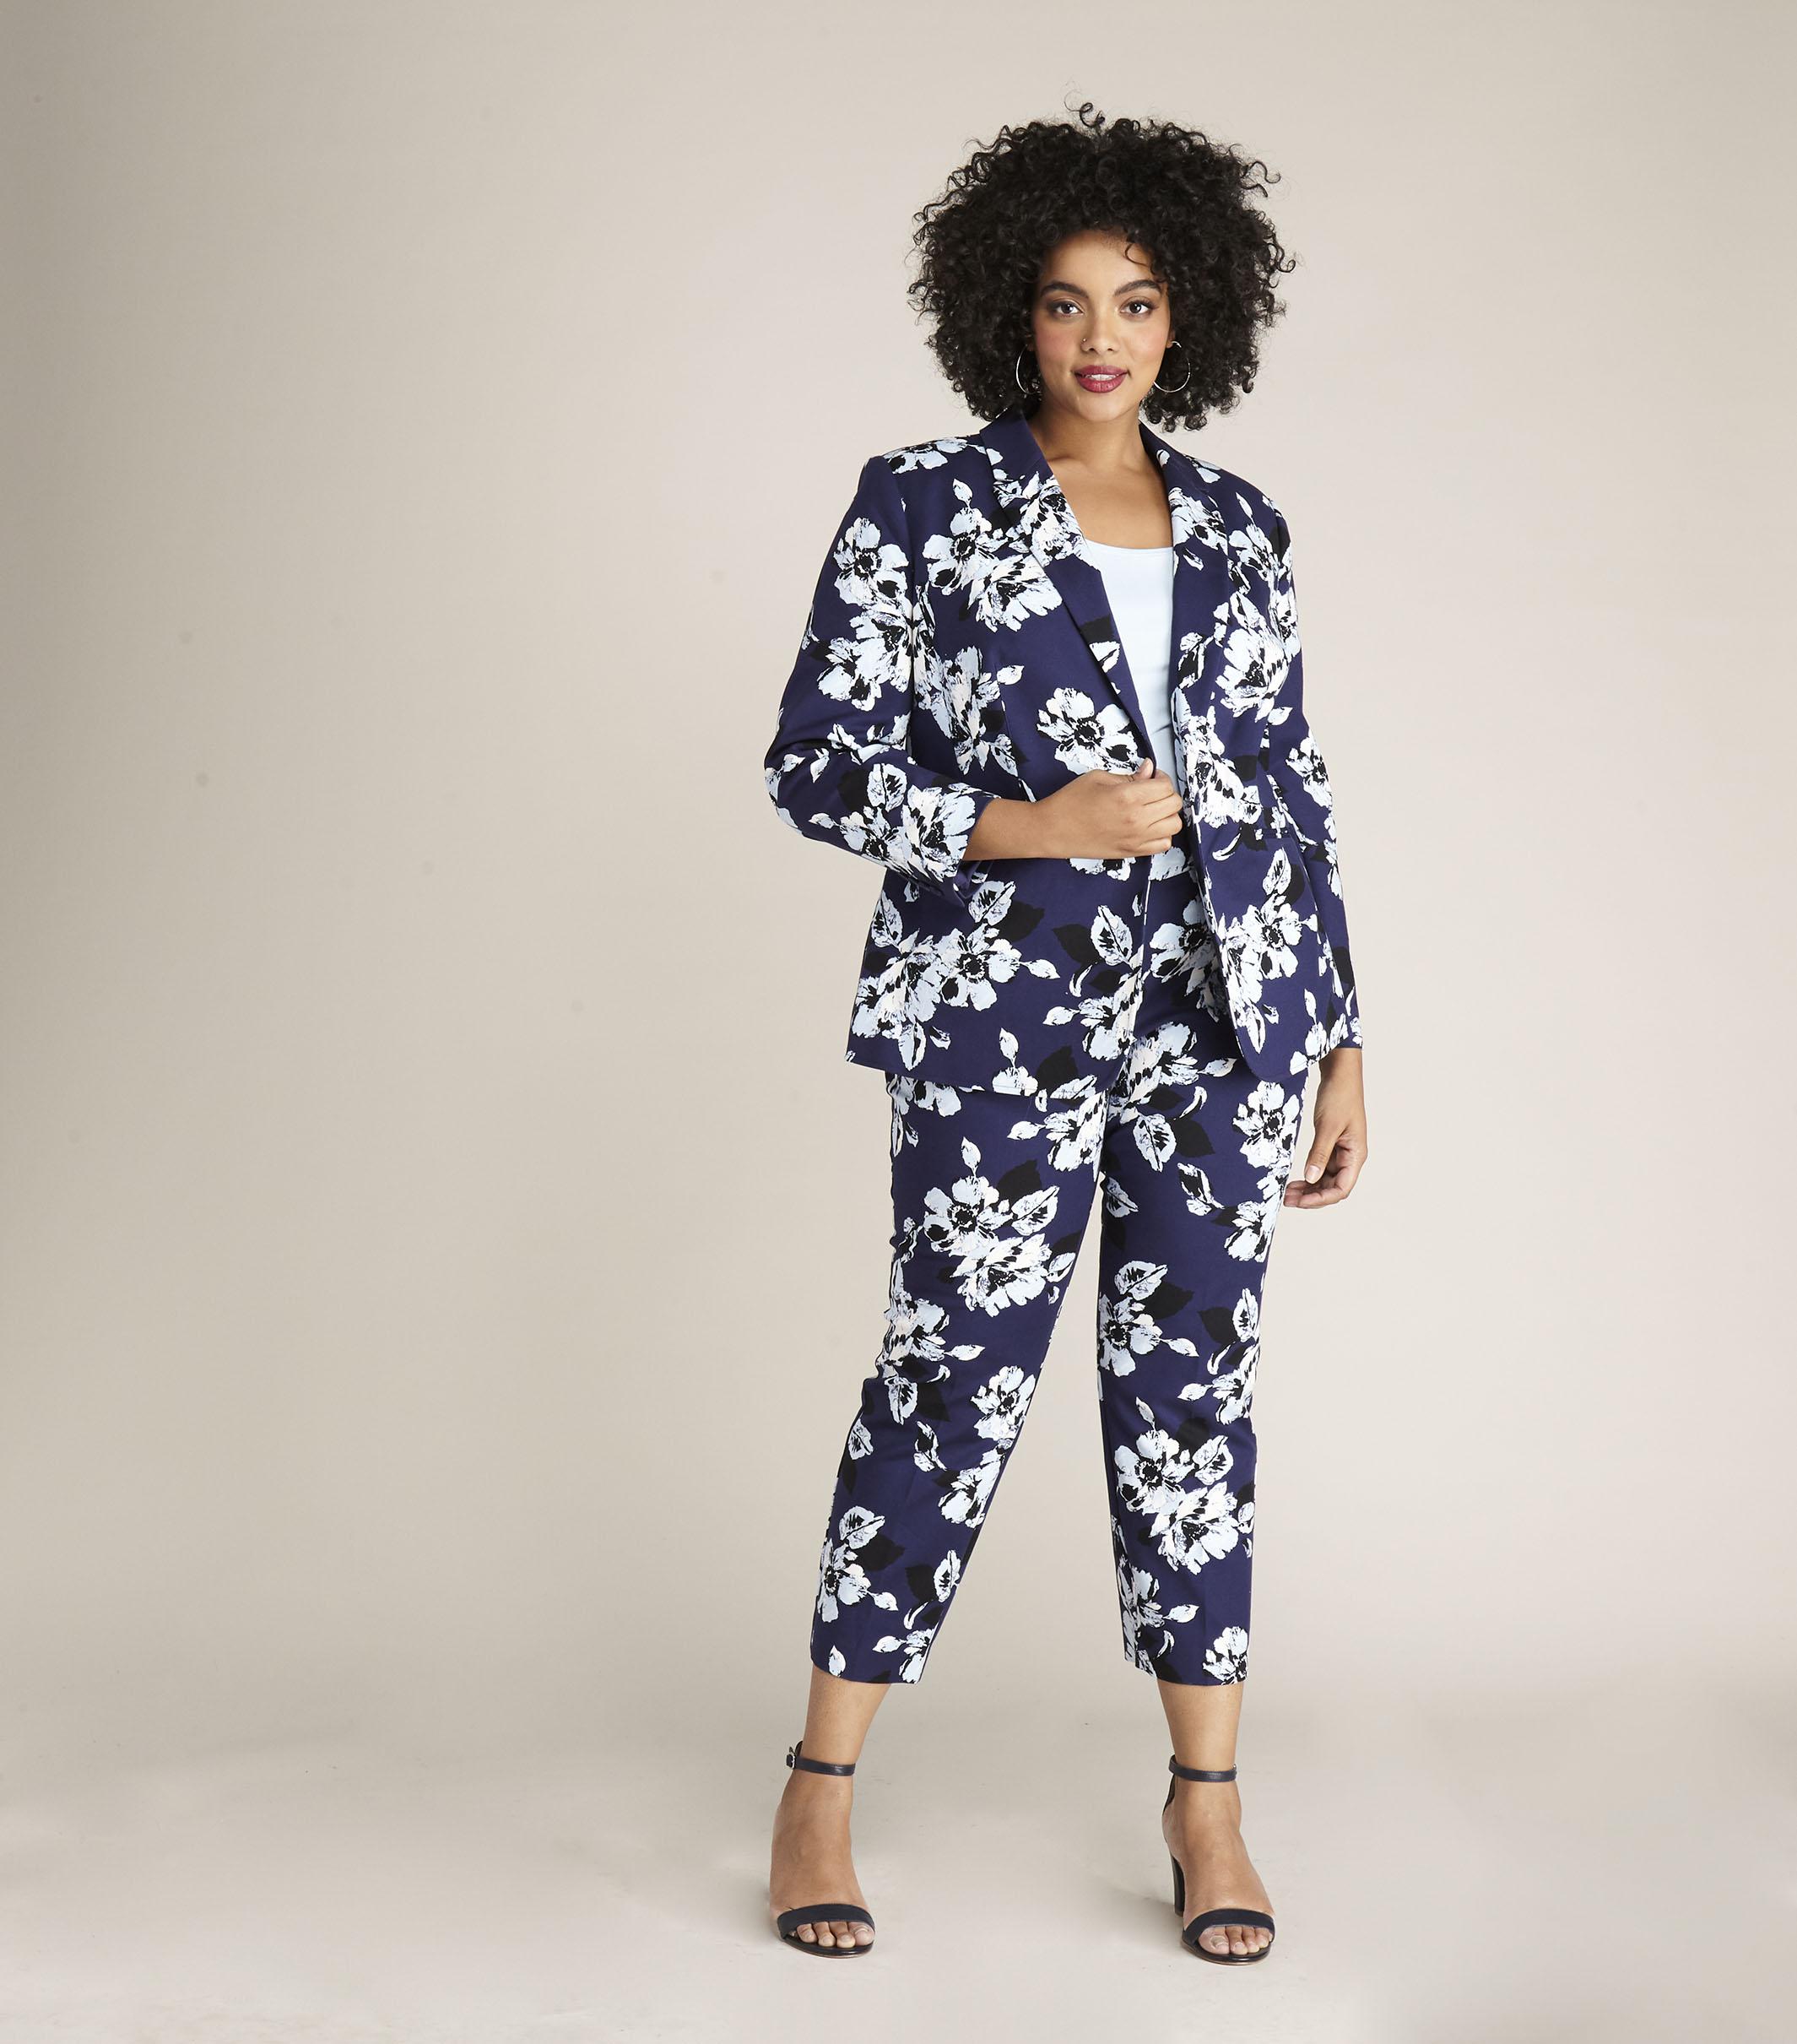 LIM_Curvy Floral Suit.jpg